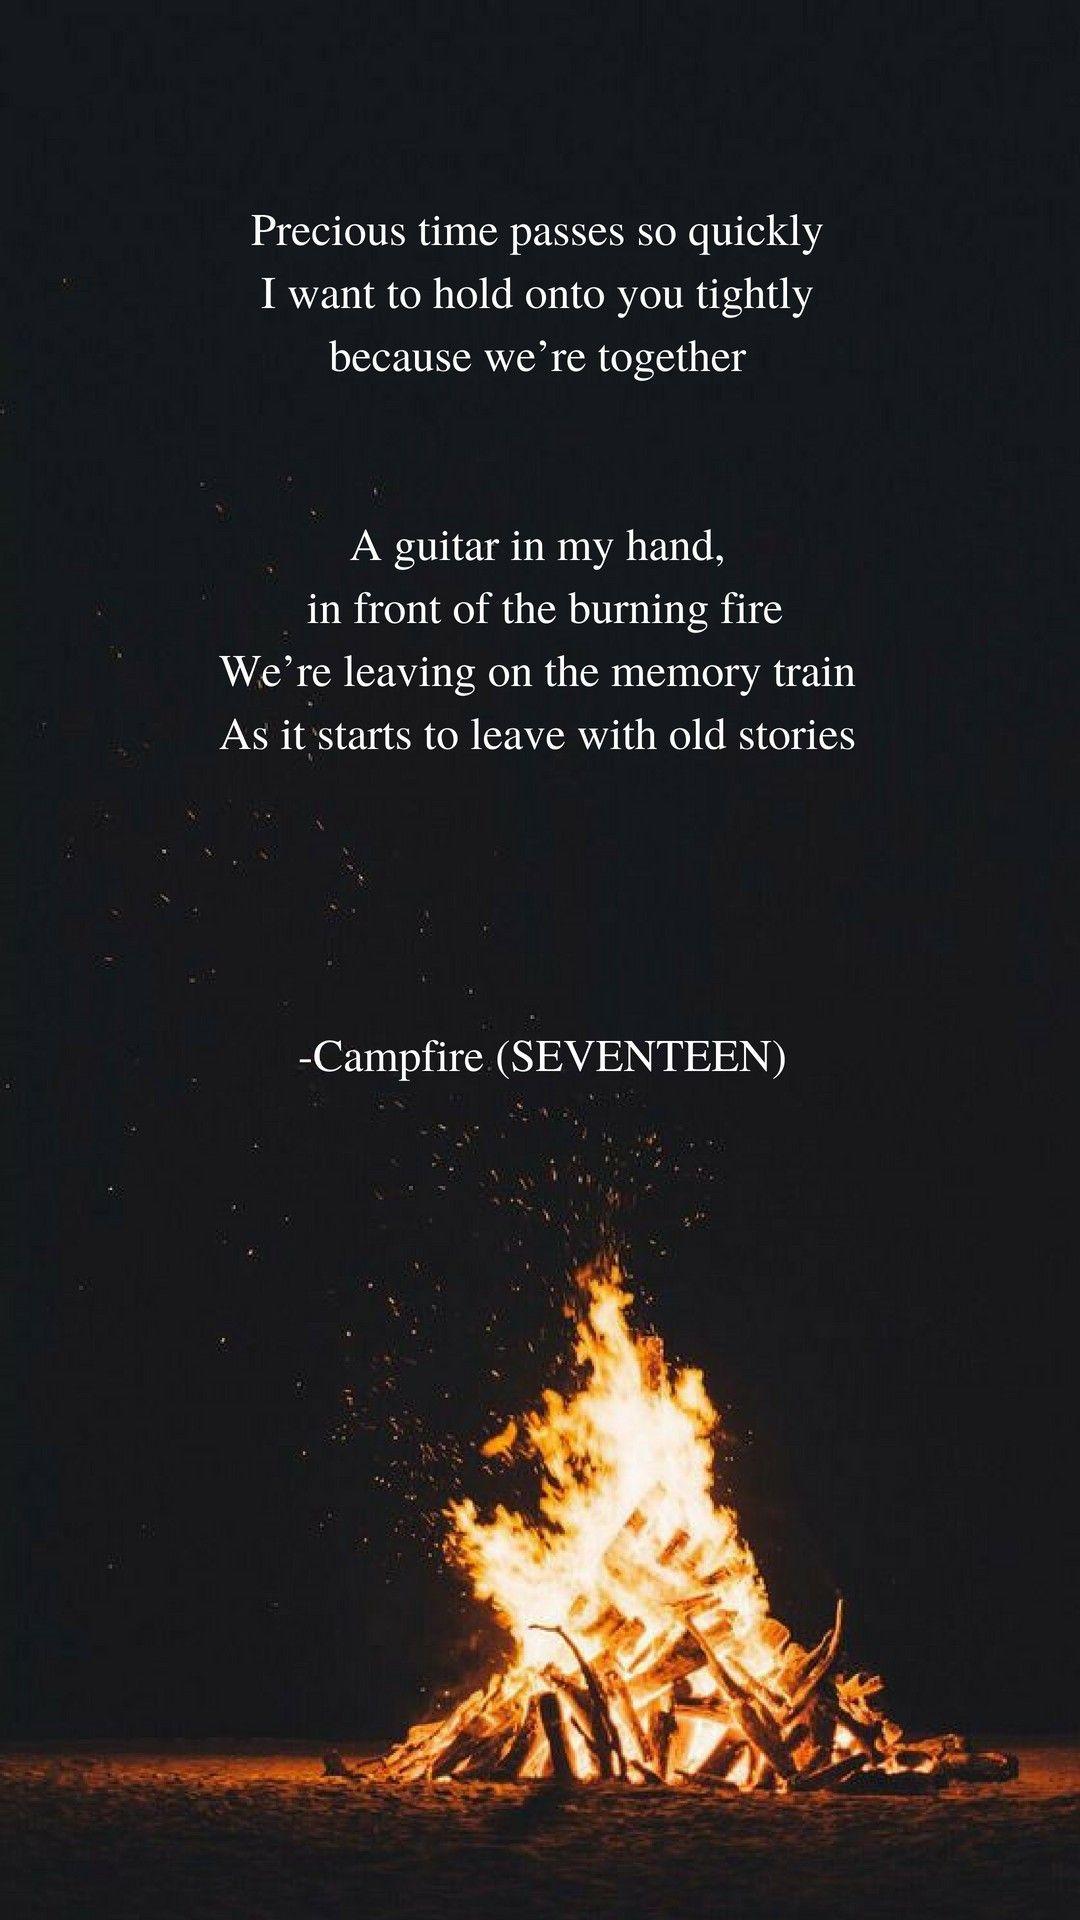 Campfire By Seventeen Lyrics Wallpaper Kutipan Lirik Lirik Lagu Kata Kata